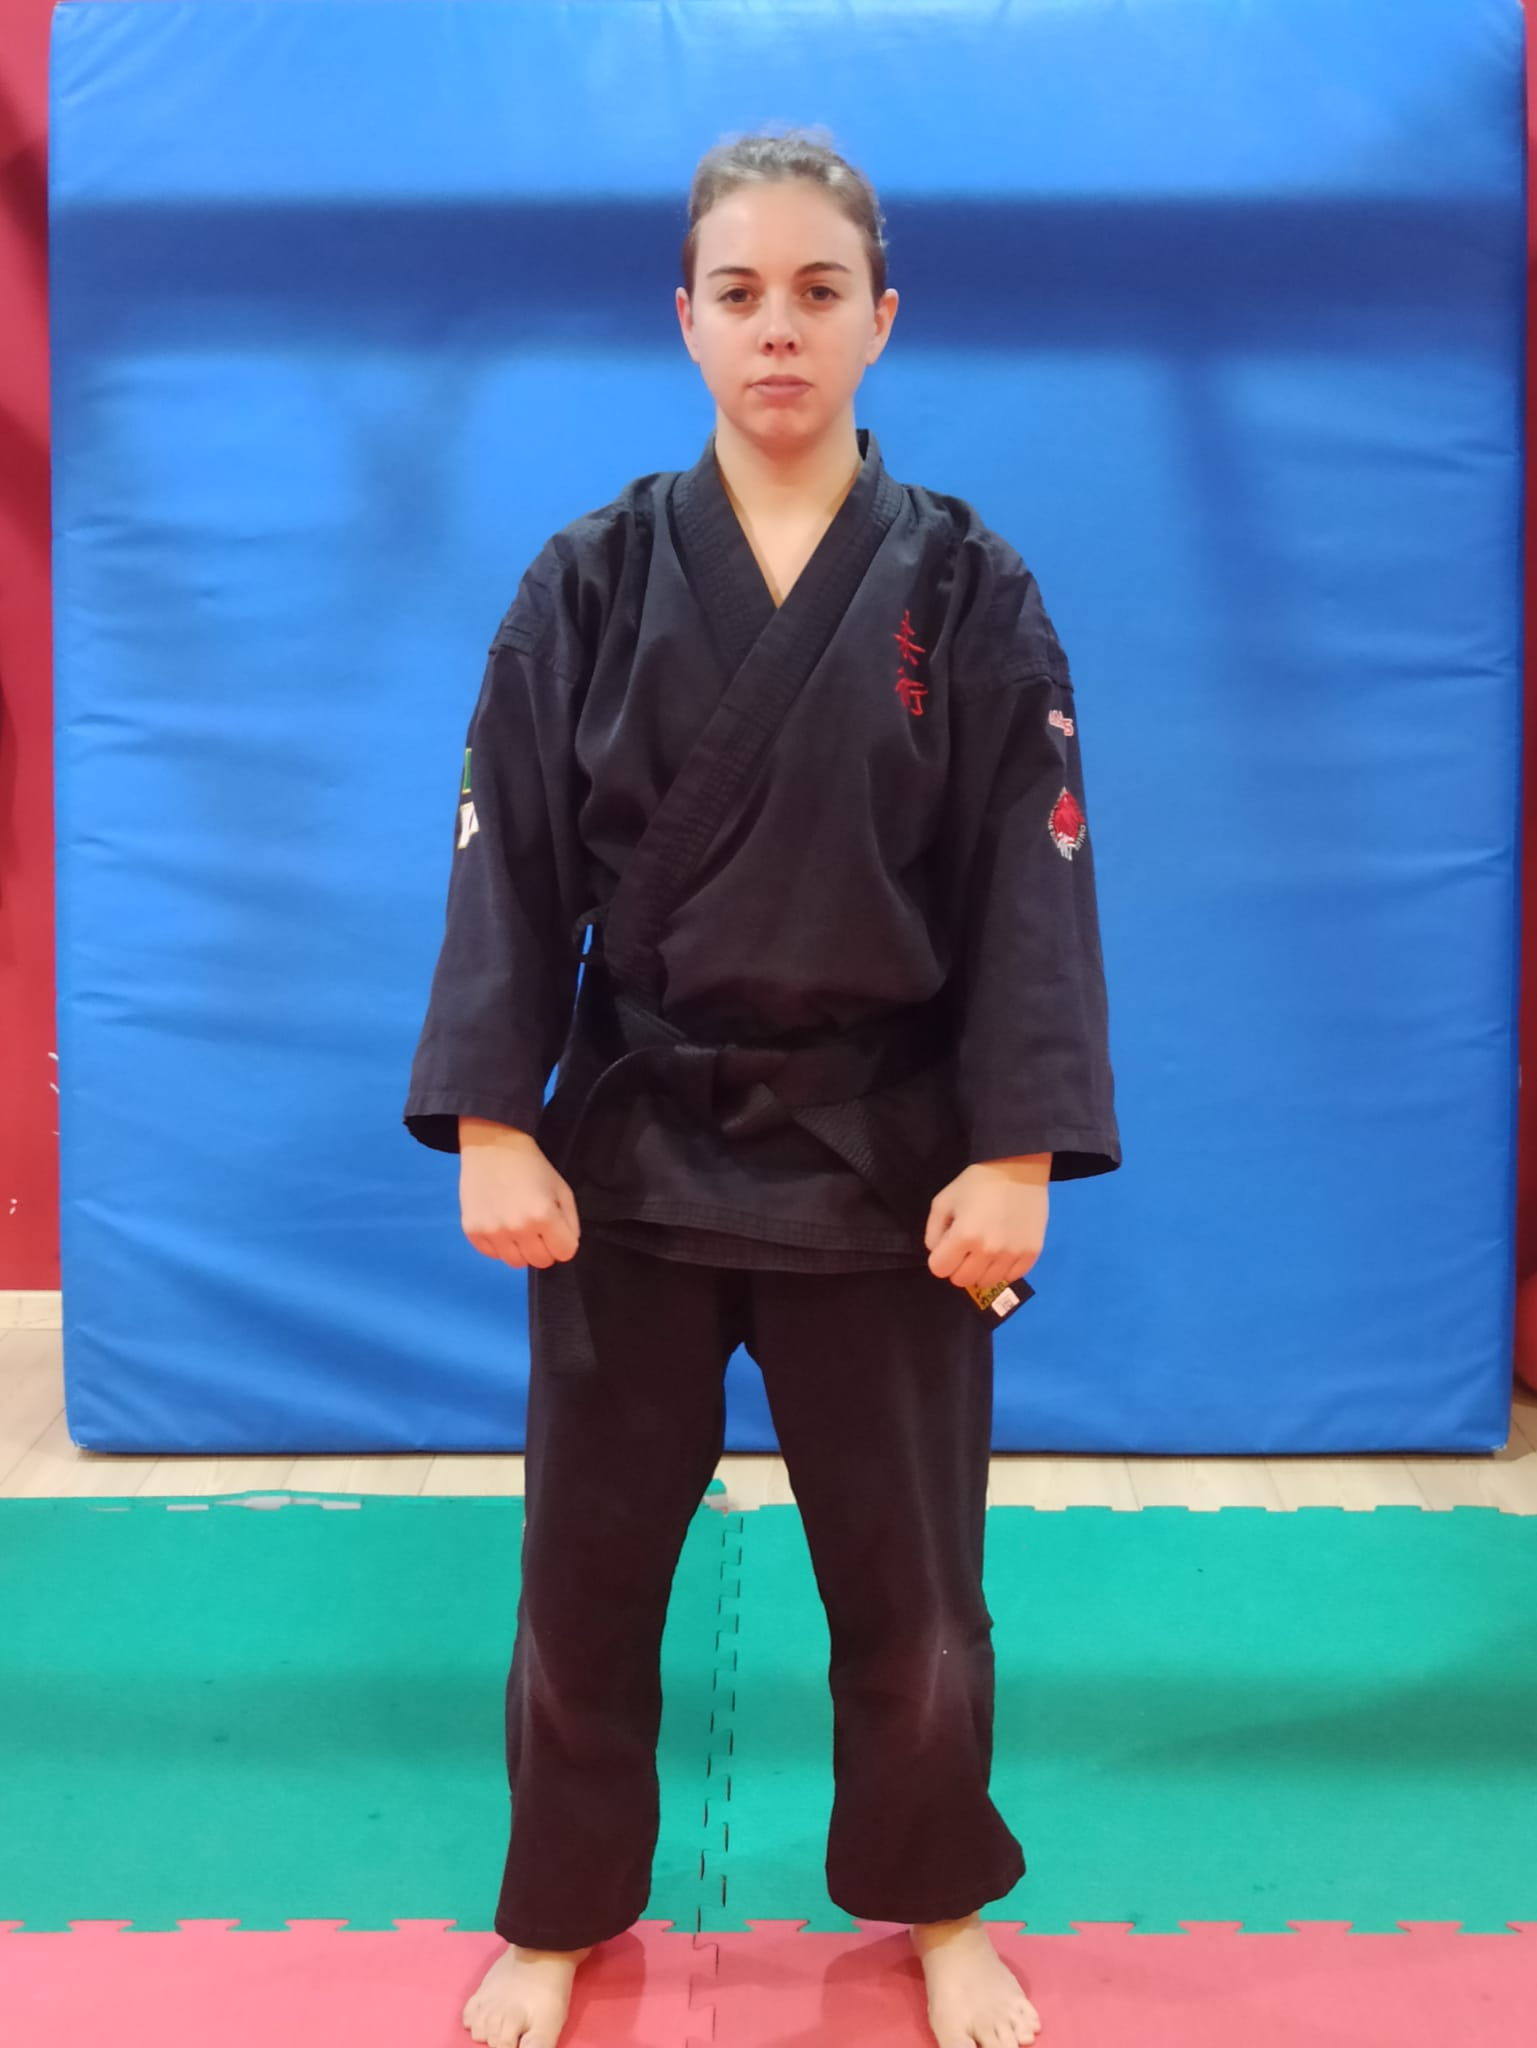 Praticante Elisa Mattei | a.s.d. yu dojo bushido ryu Pomezia